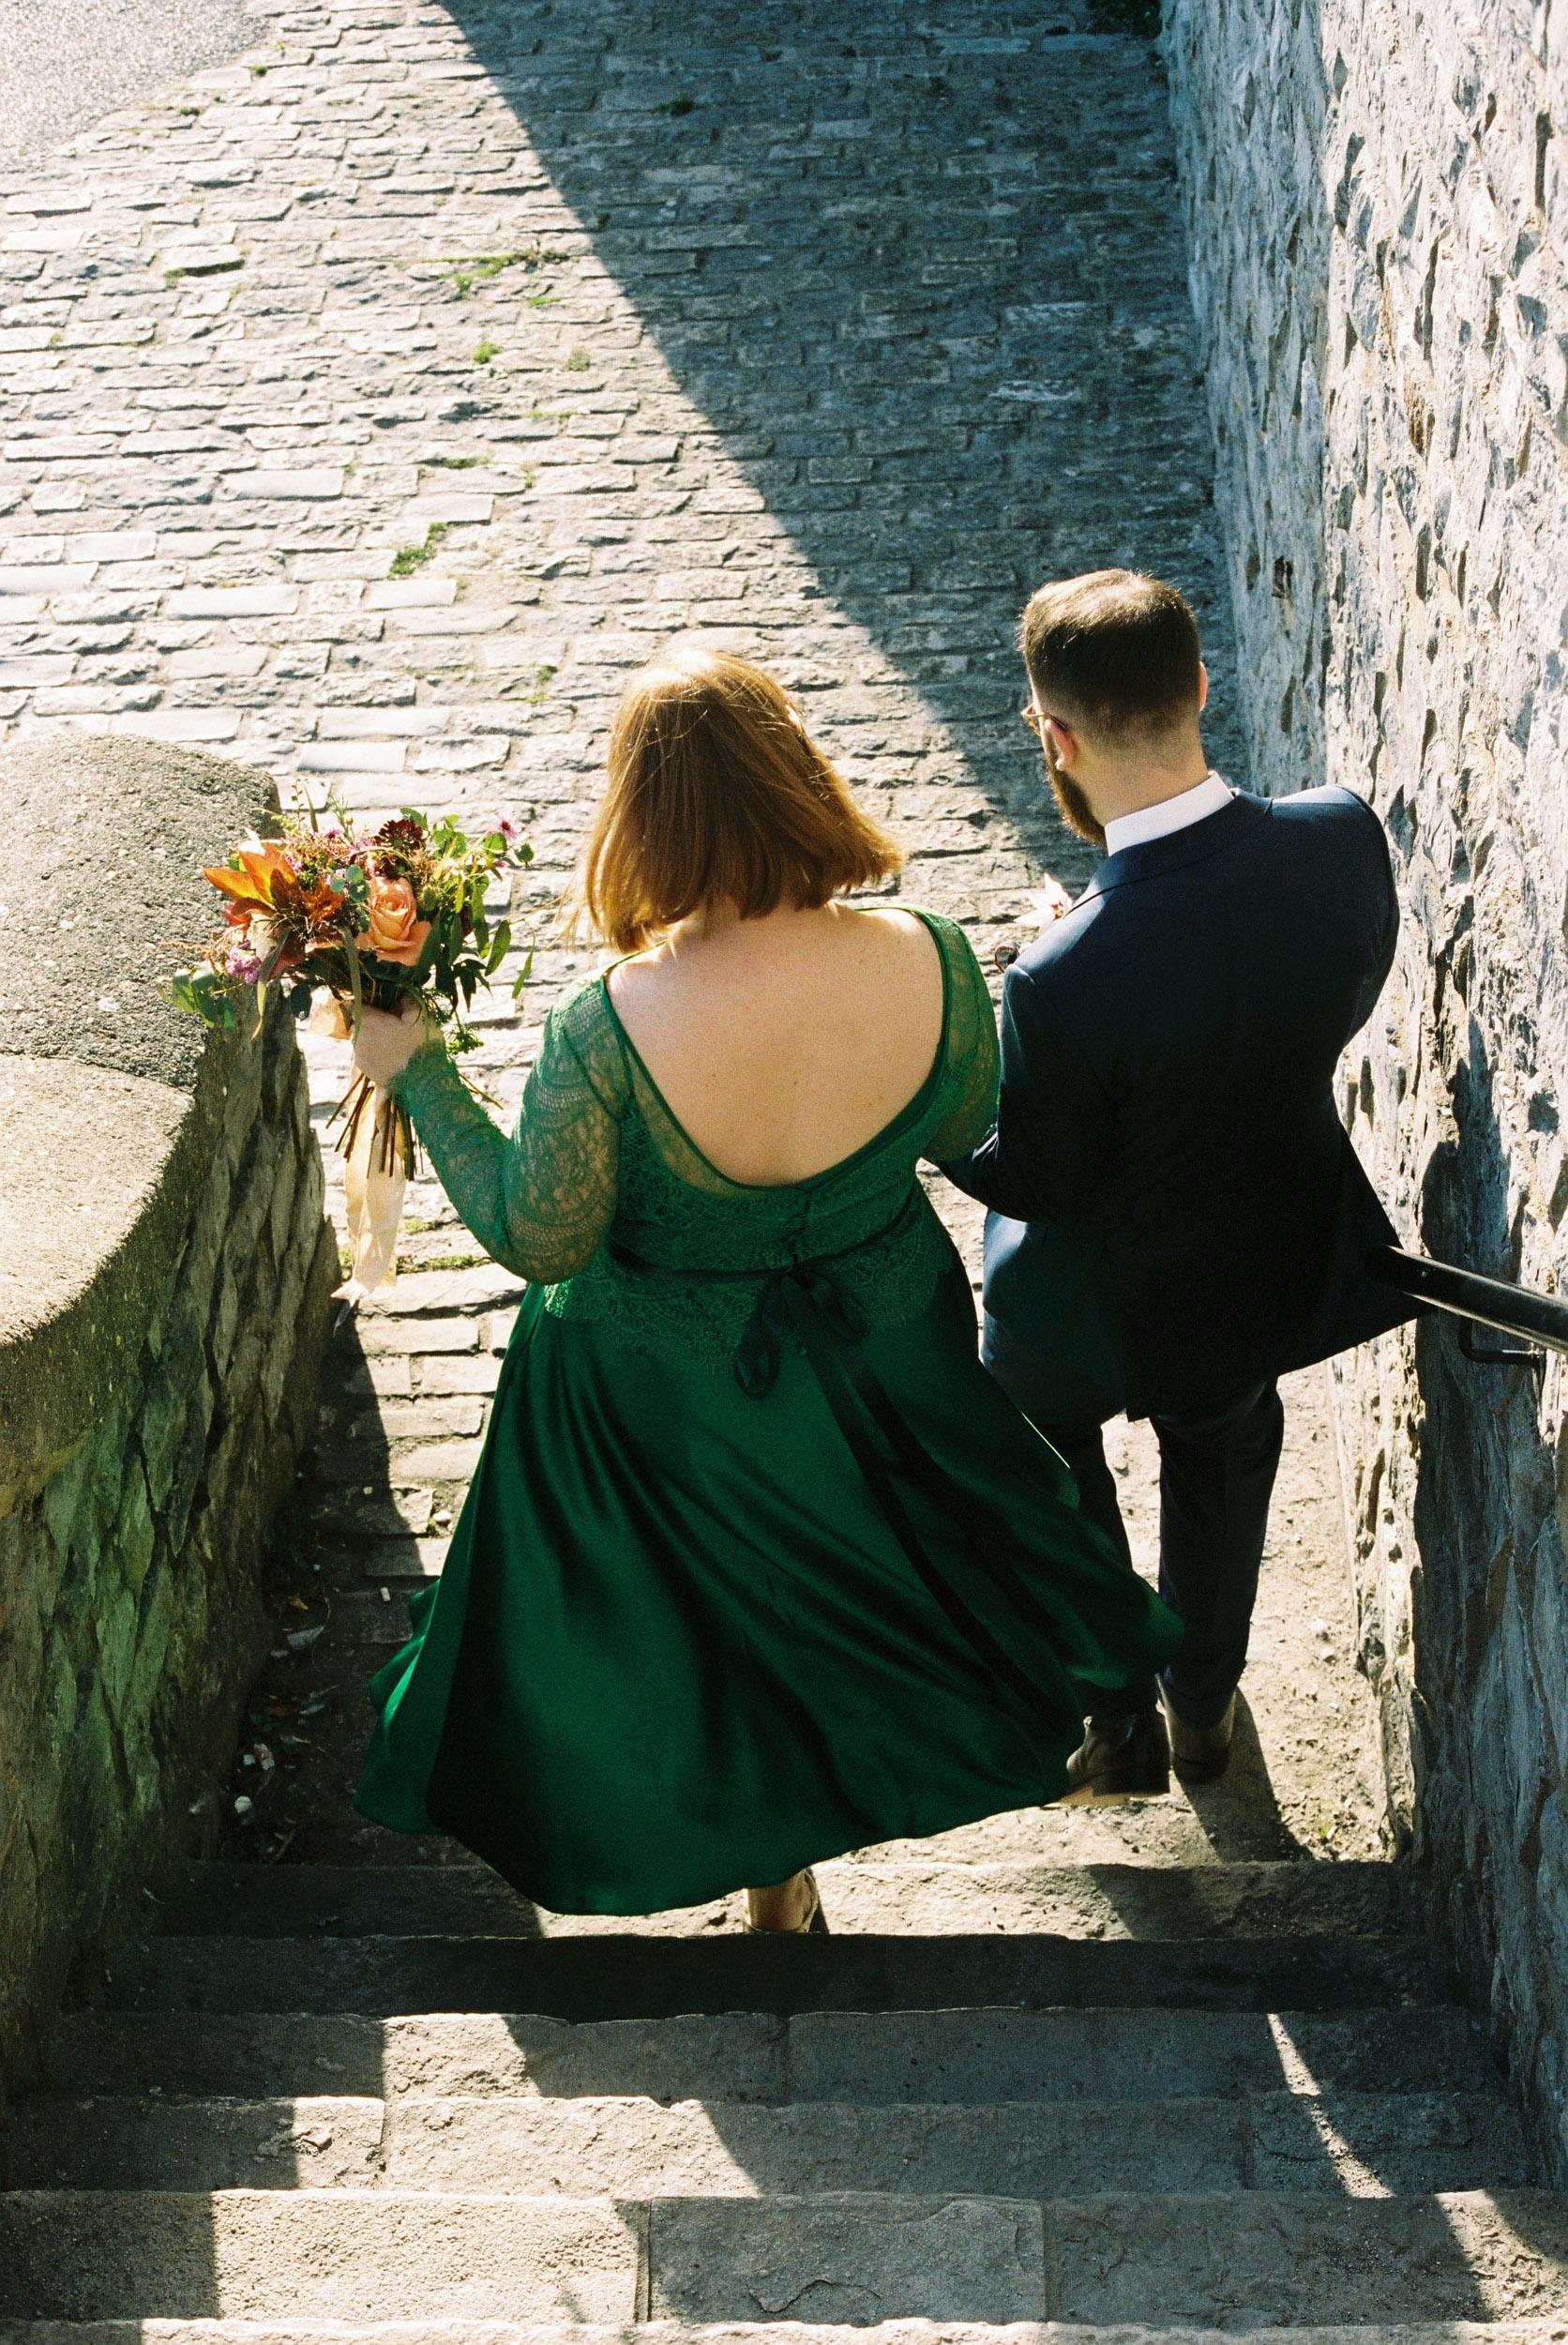 Lucy-Bespoke-Green-Silk-Lace-Wedding-Dress-Kate-Beaumont-Sheffield-16.jpg